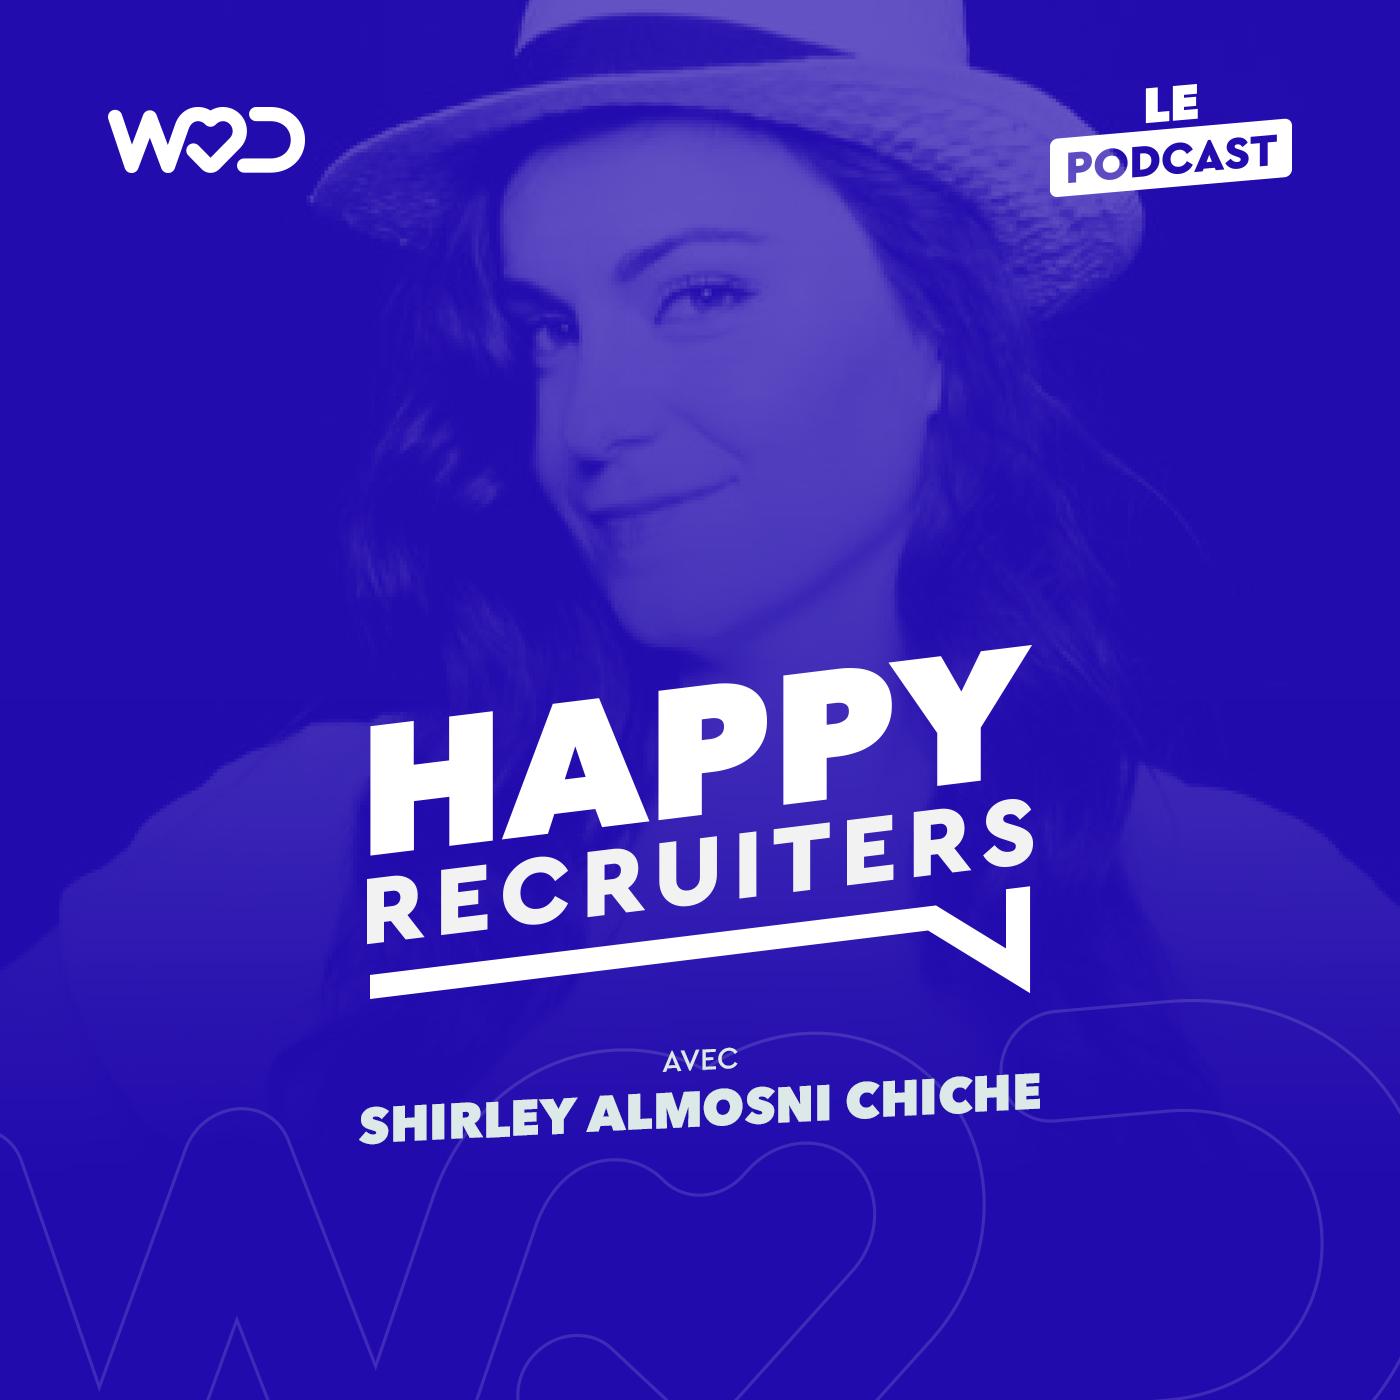 Le Podcast- Shirley Almosni